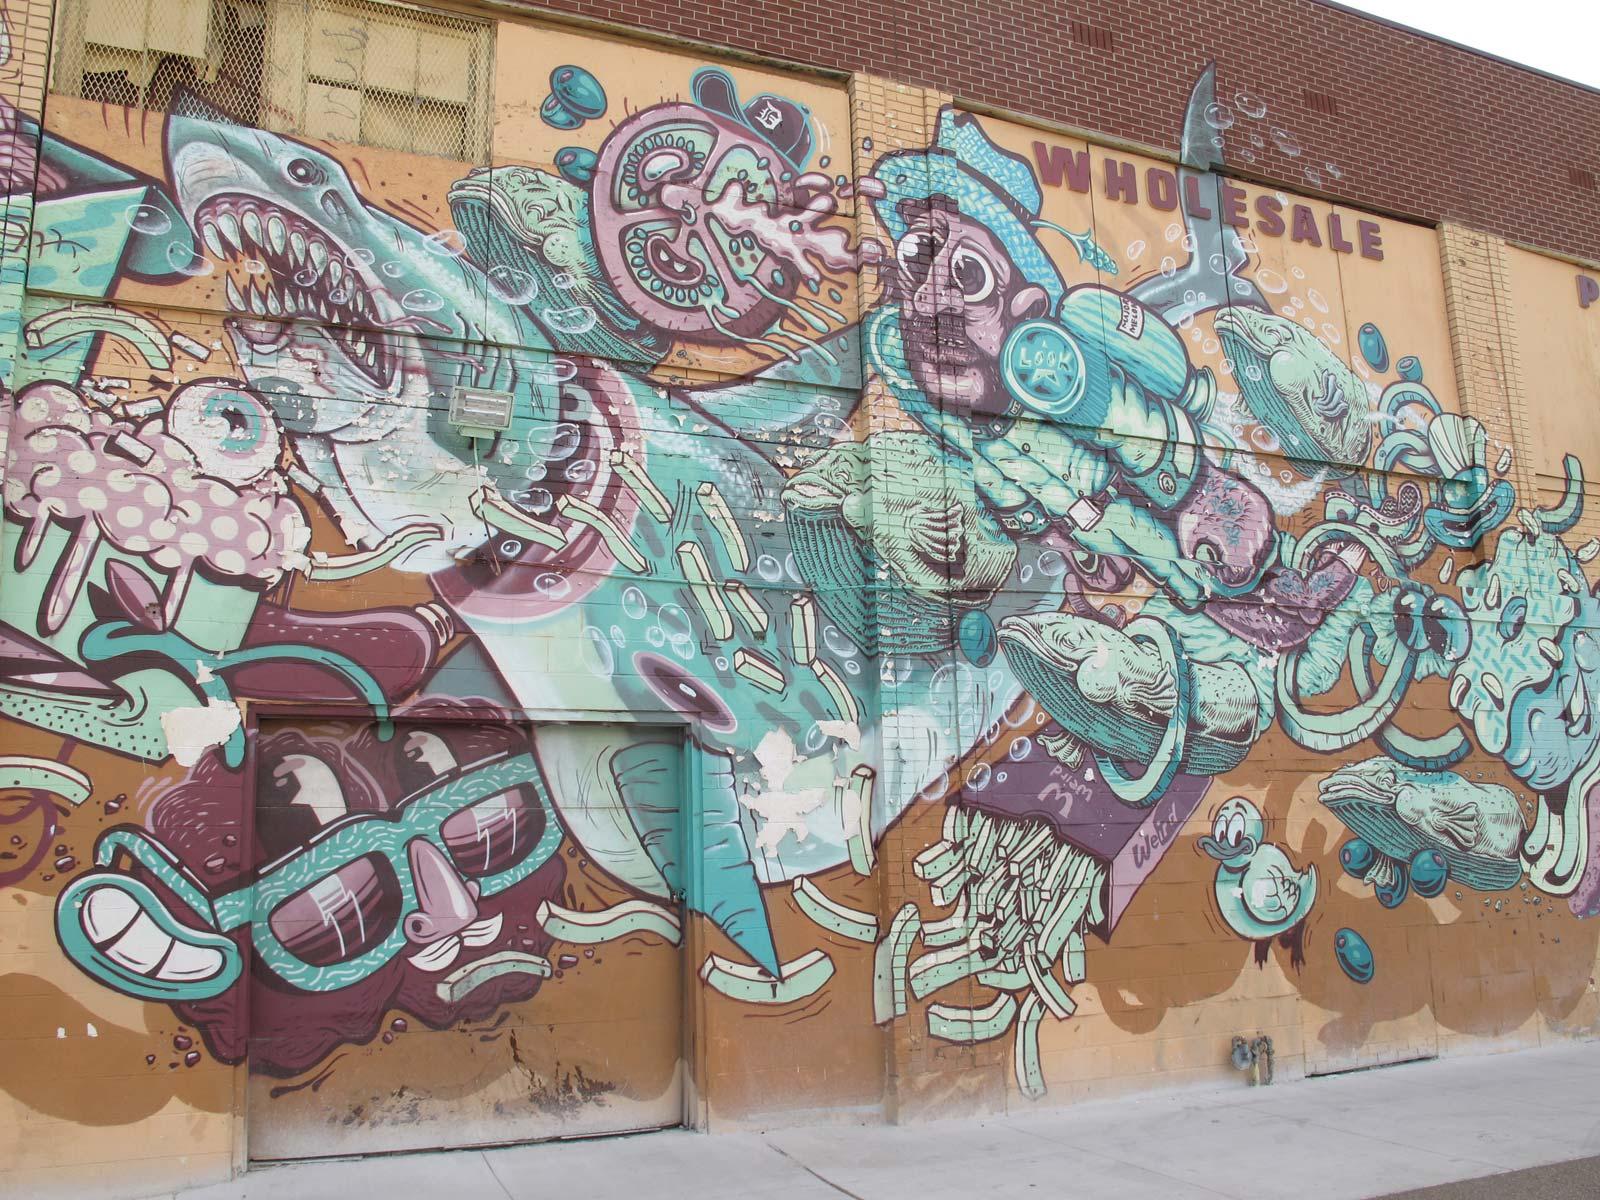 DetroitWall_9367.jpg